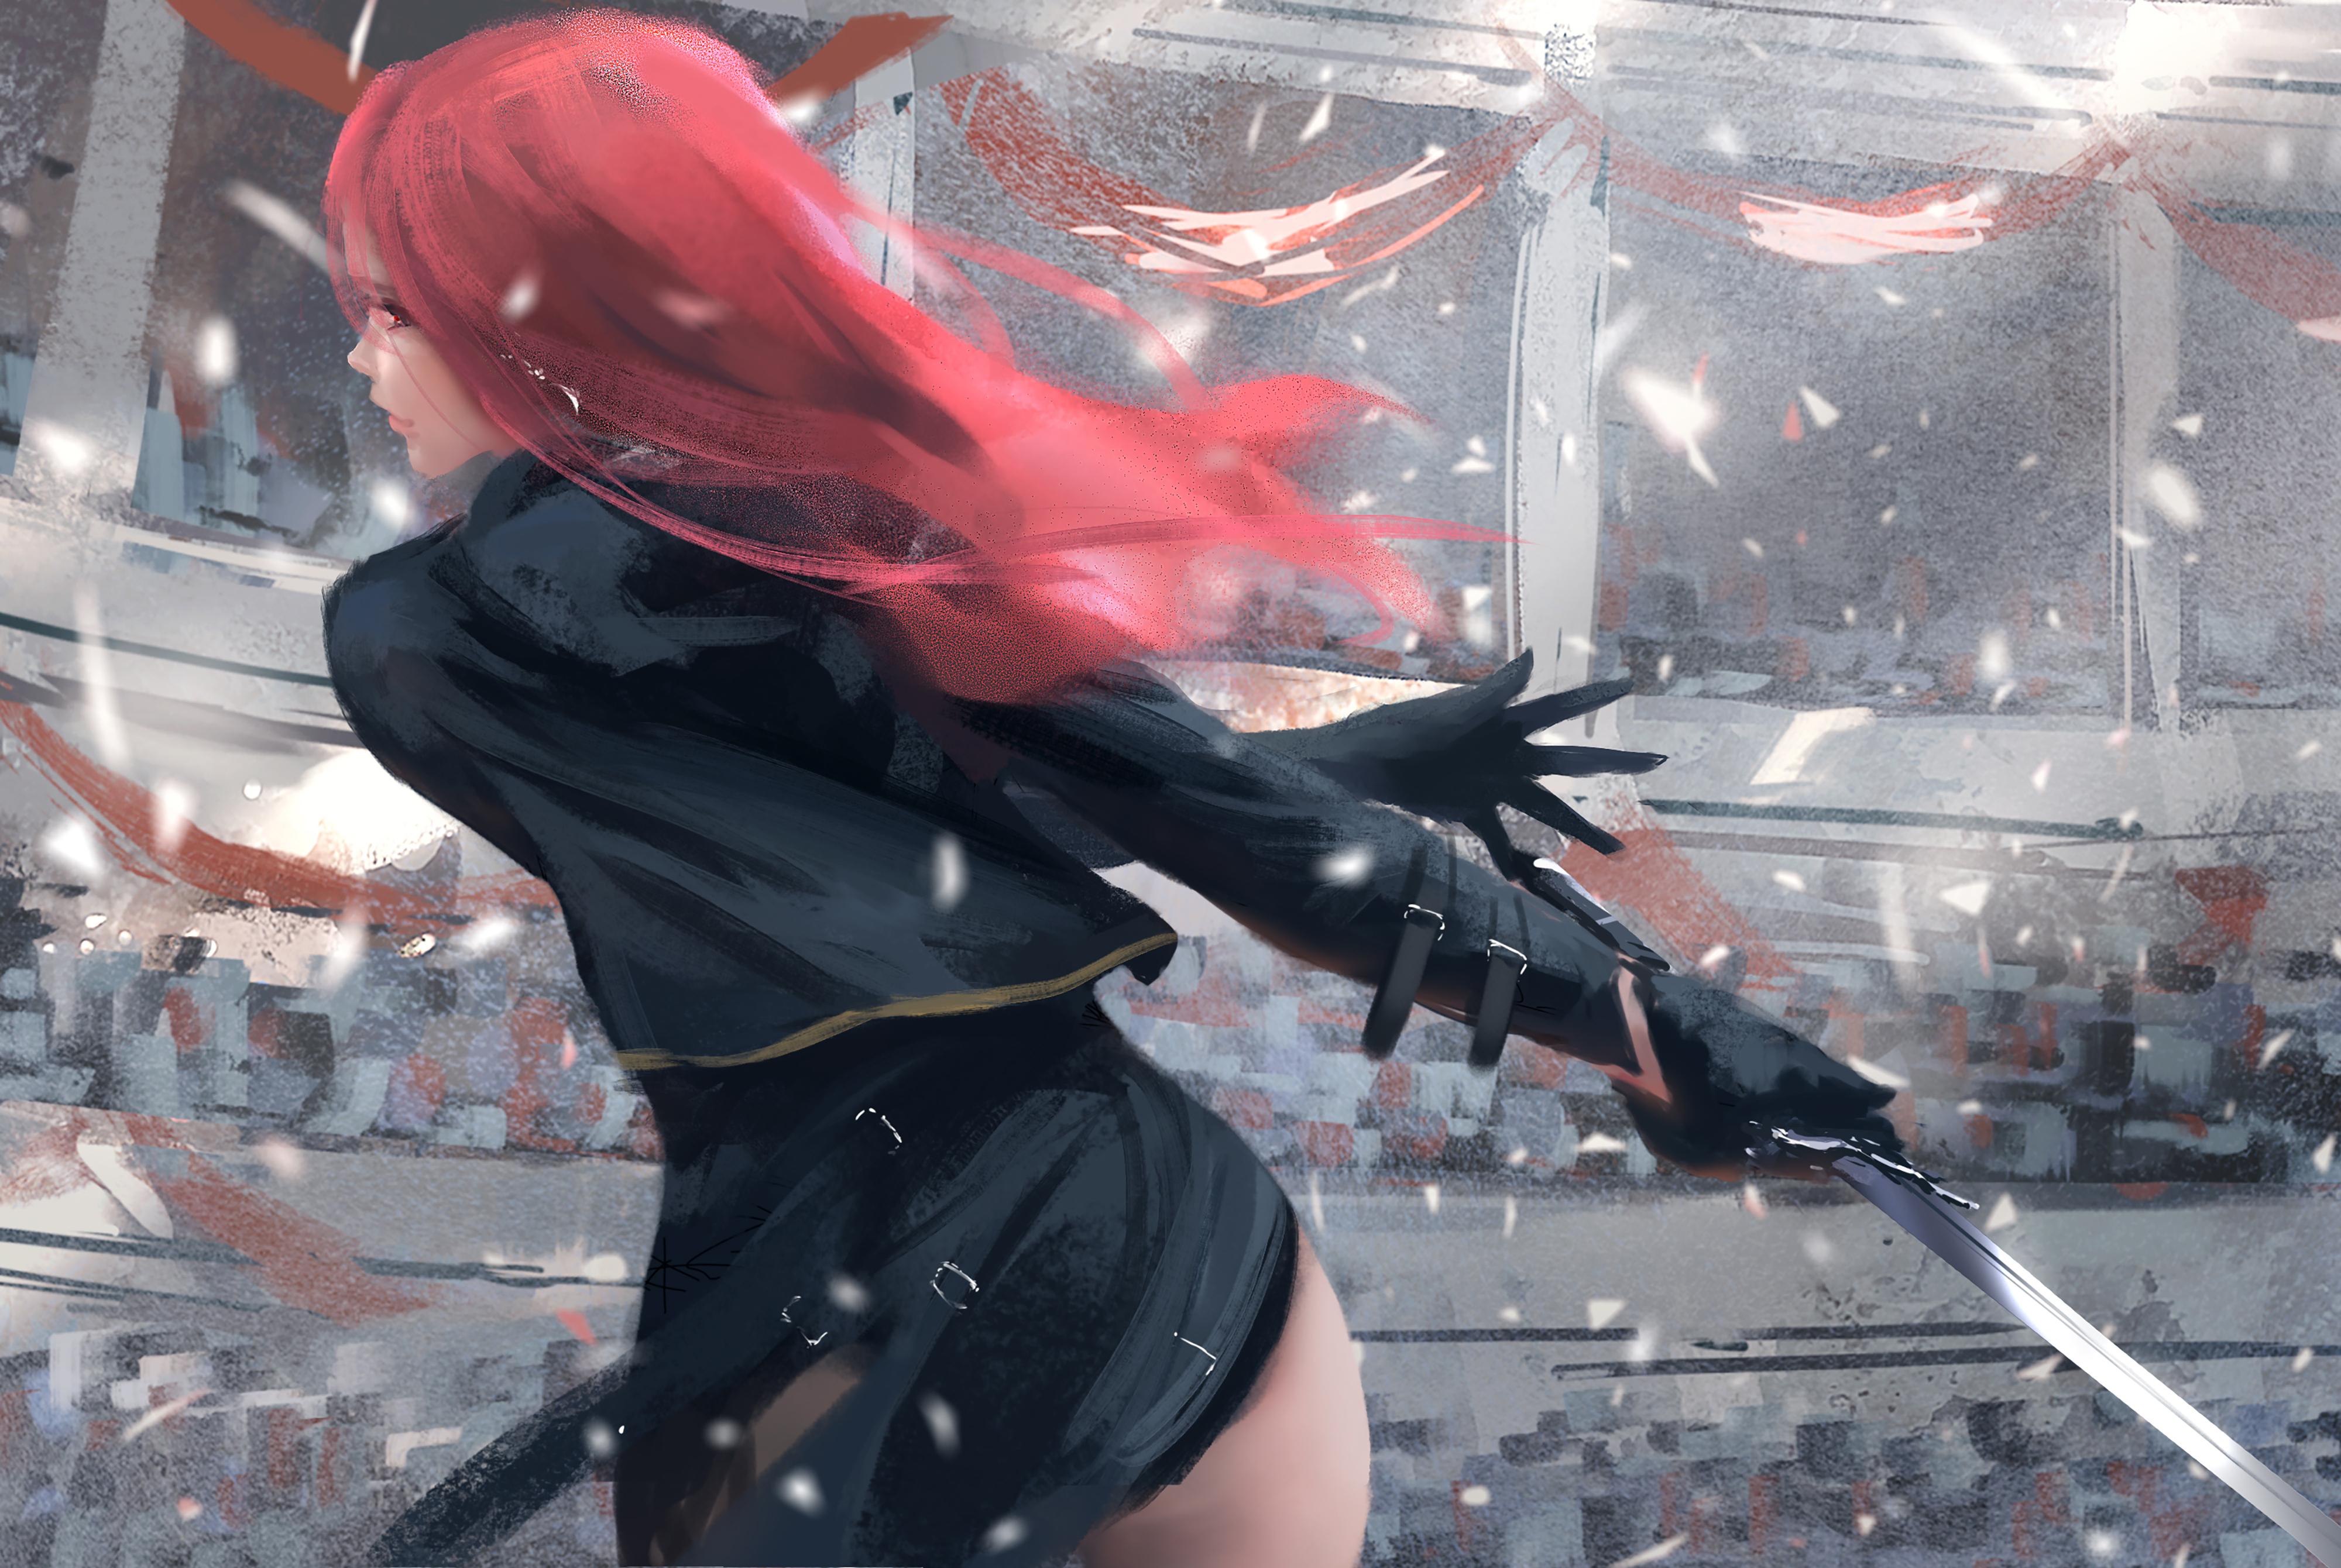 Wallpaper : WLOP, Ghost Blade, women, redhead, digital art